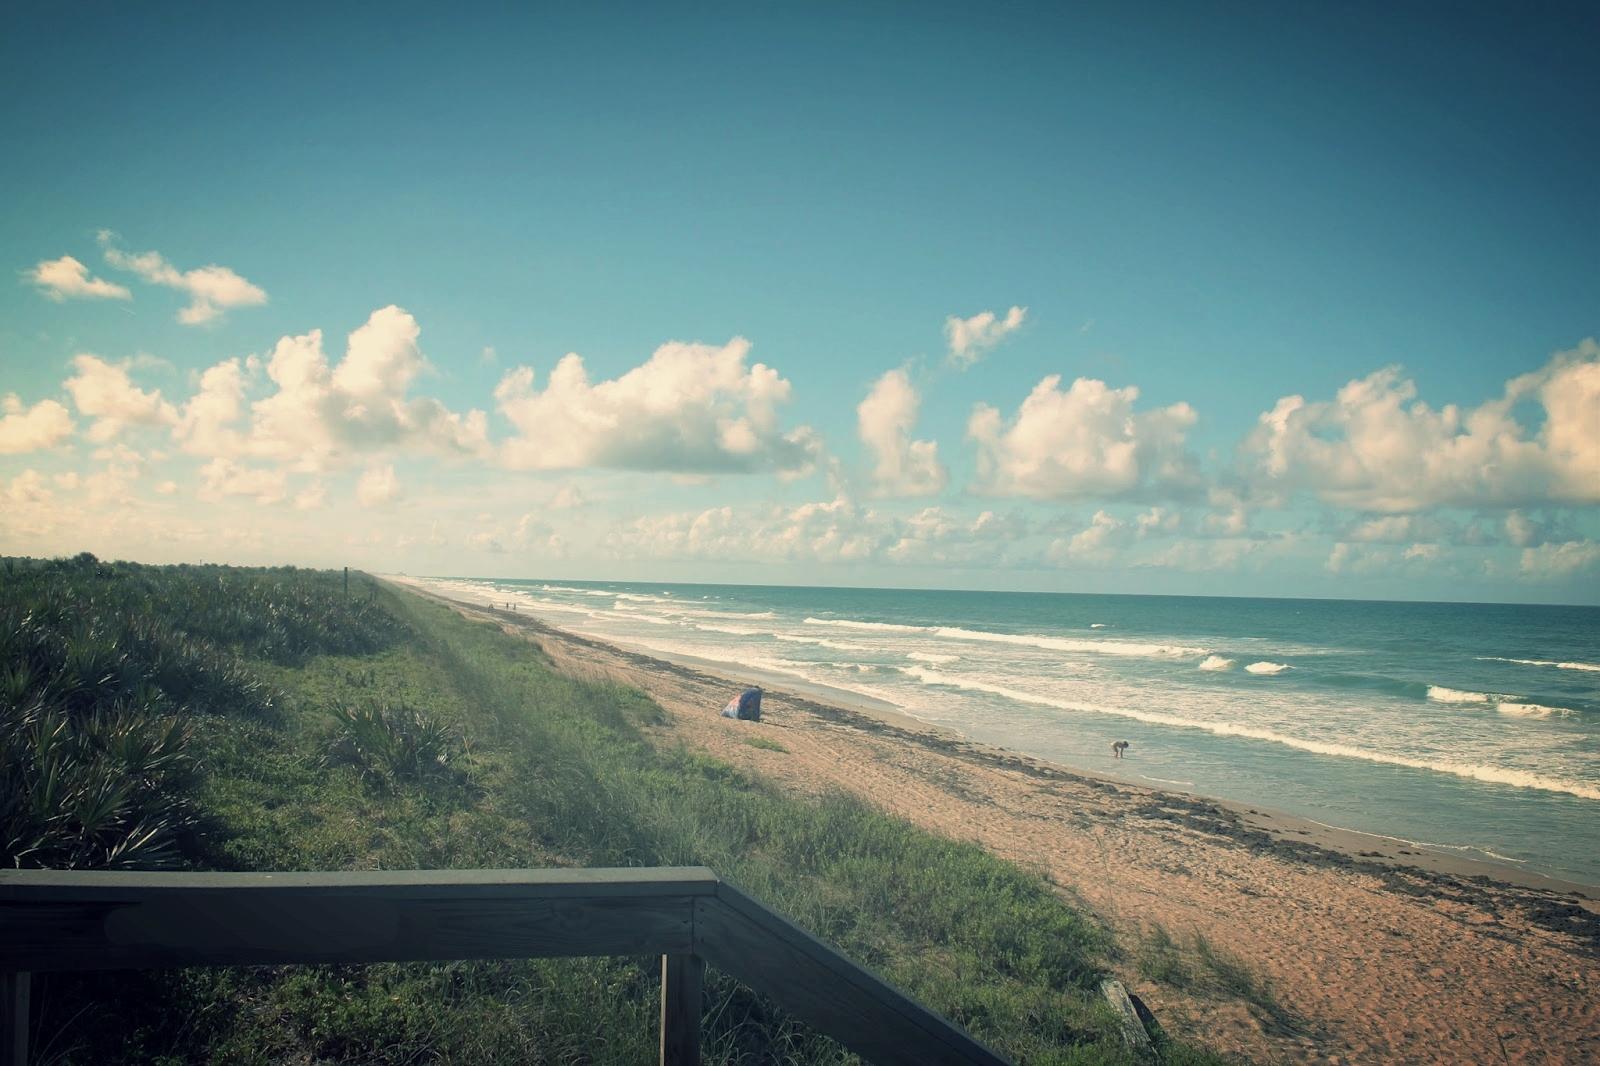 Canaveral National Seashore Florida May 2015 Copyright Phillip Lott Phillip's Natural World beach d.jpg